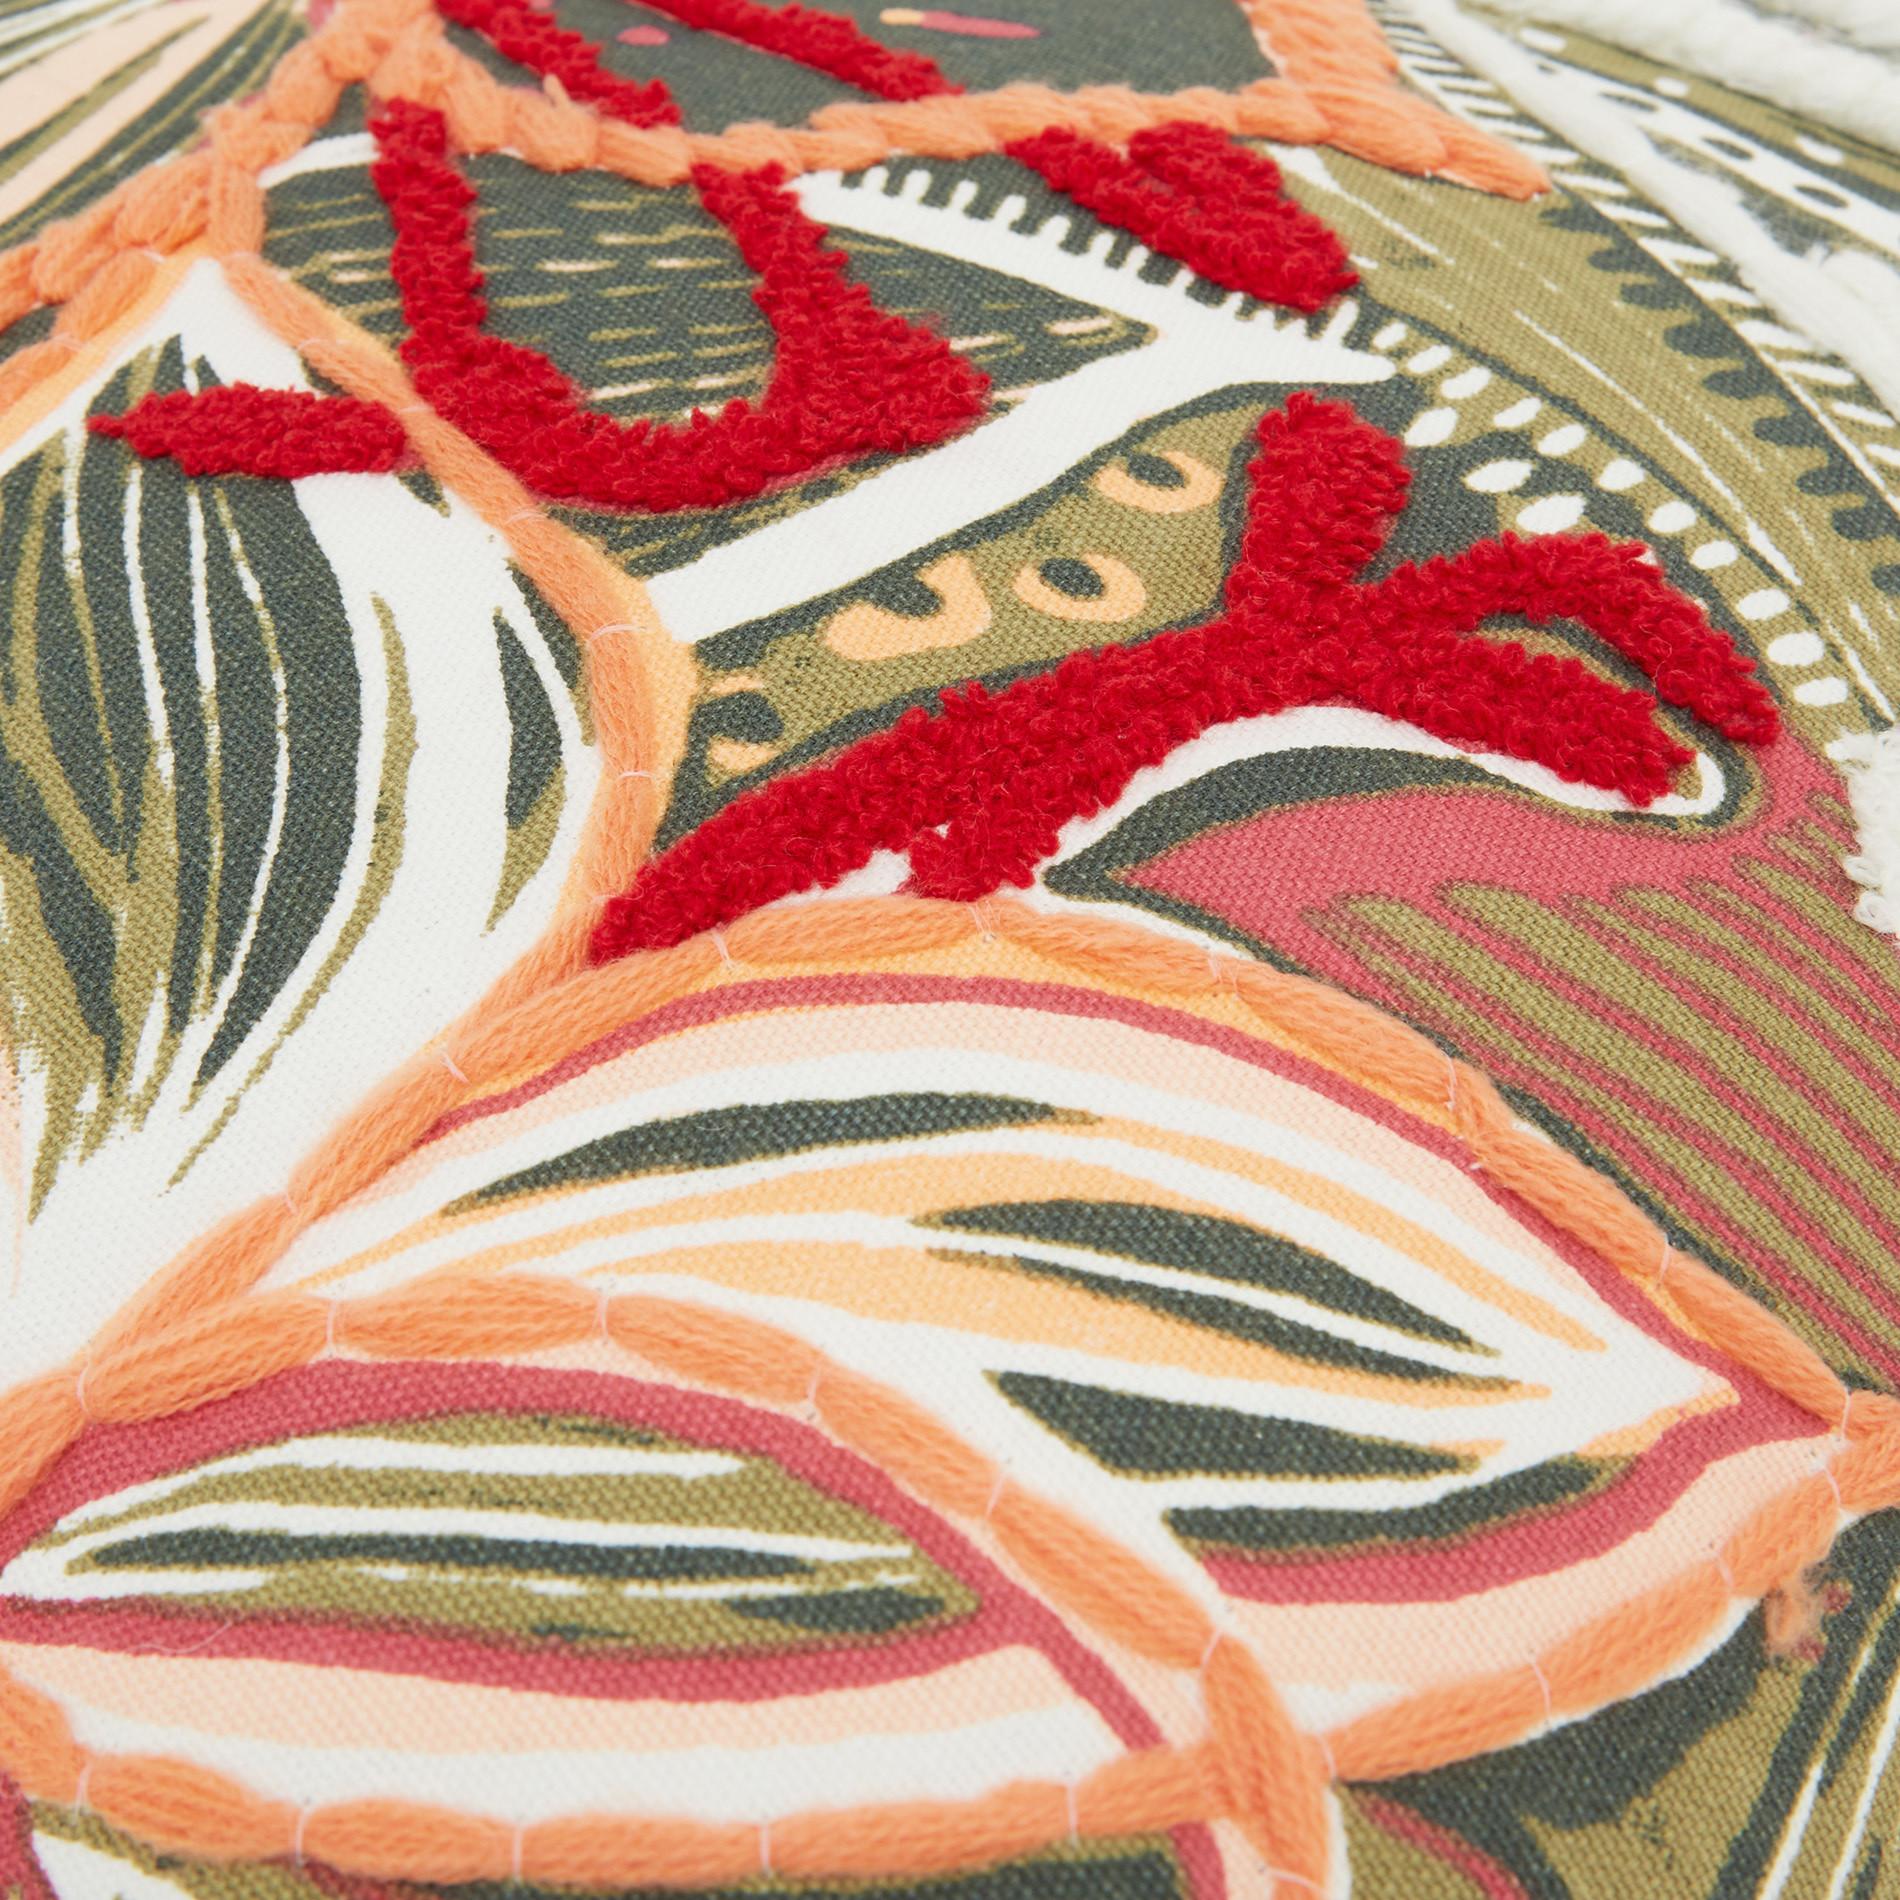 Cuscino ricamo foglie 45x45cm, Multicolor, large image number 3